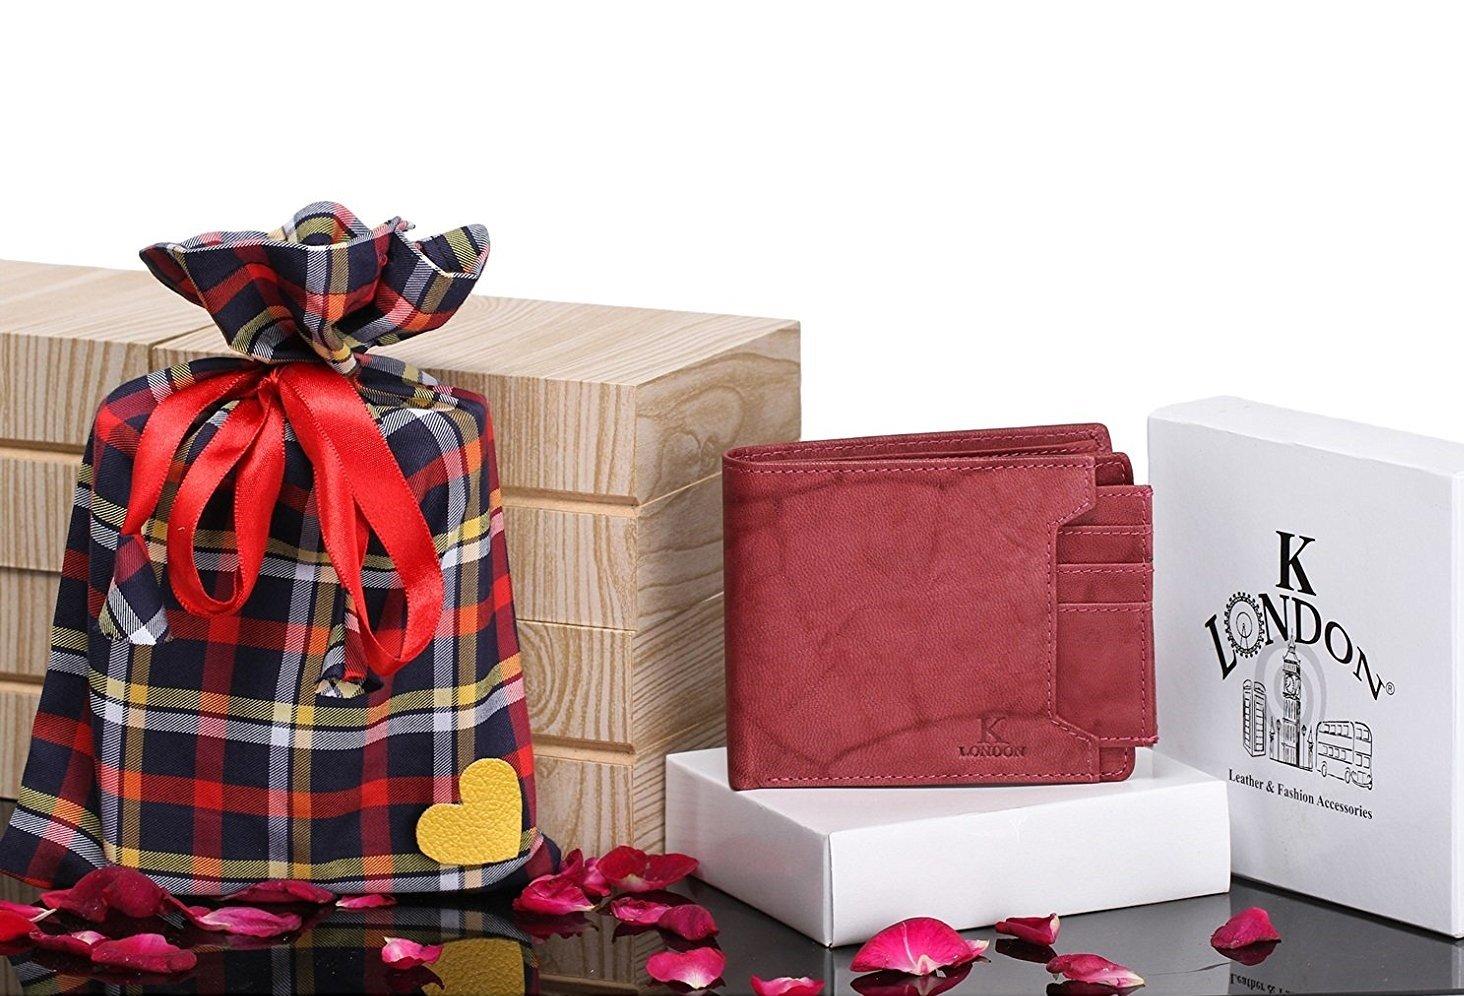 K London Special Day Gift Anniversary Birthday Vintage Look Sleek Card Coin Pocket Mens Wallet Tan 5007 Maroon Antq Gi Amazonin Bags